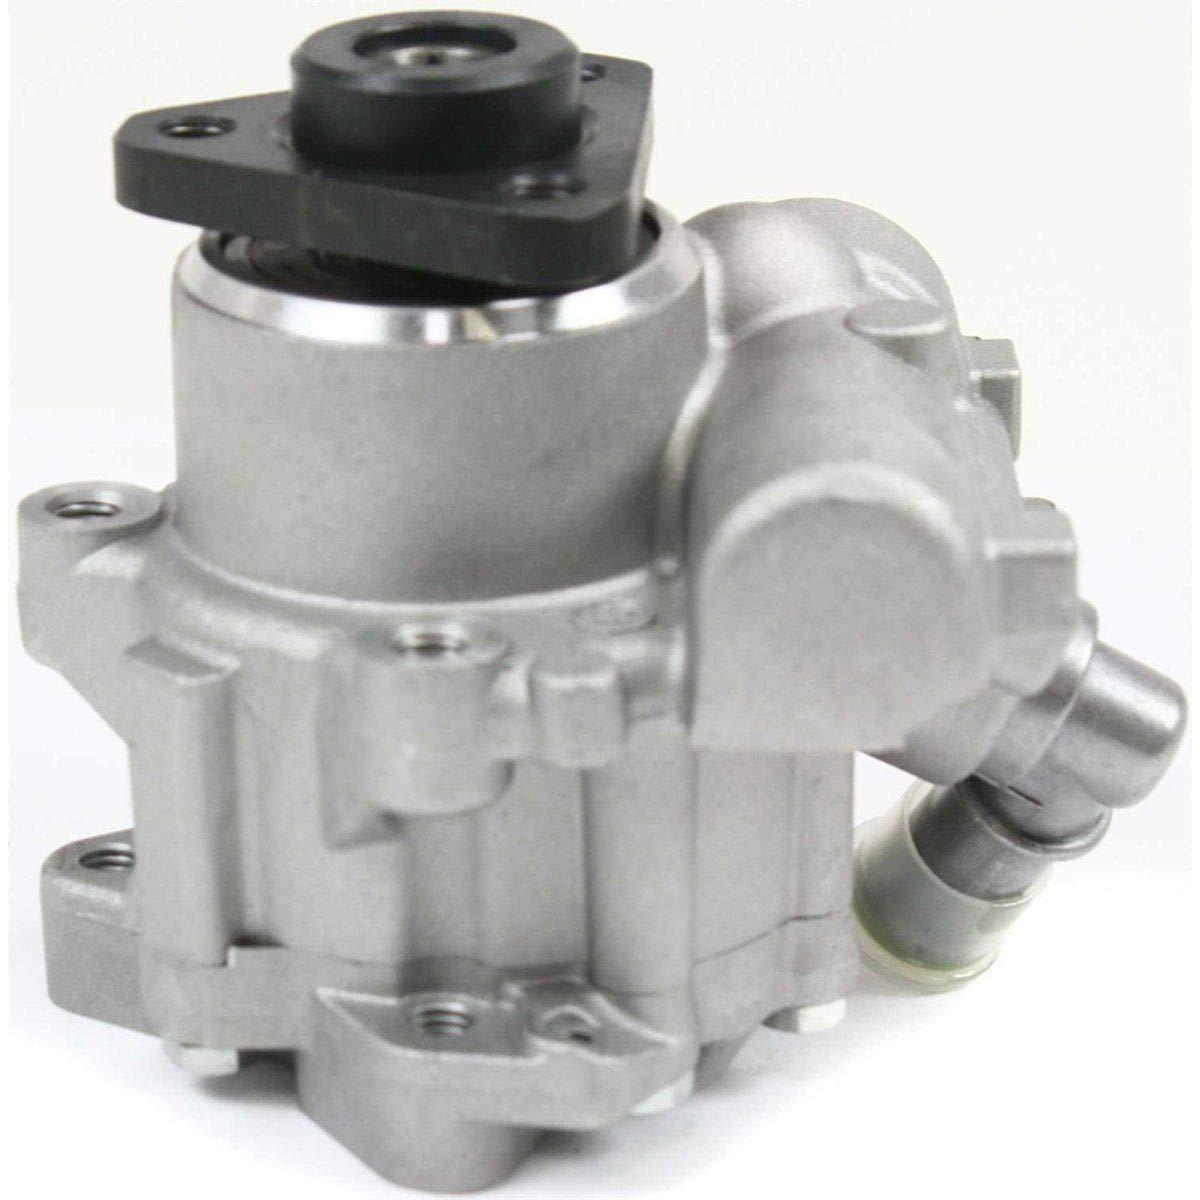 New Power Steering Pump Fit for BMW E46 320i 325i 325Ci 330i 330Ci 2001-2003 32416756582 SWSD